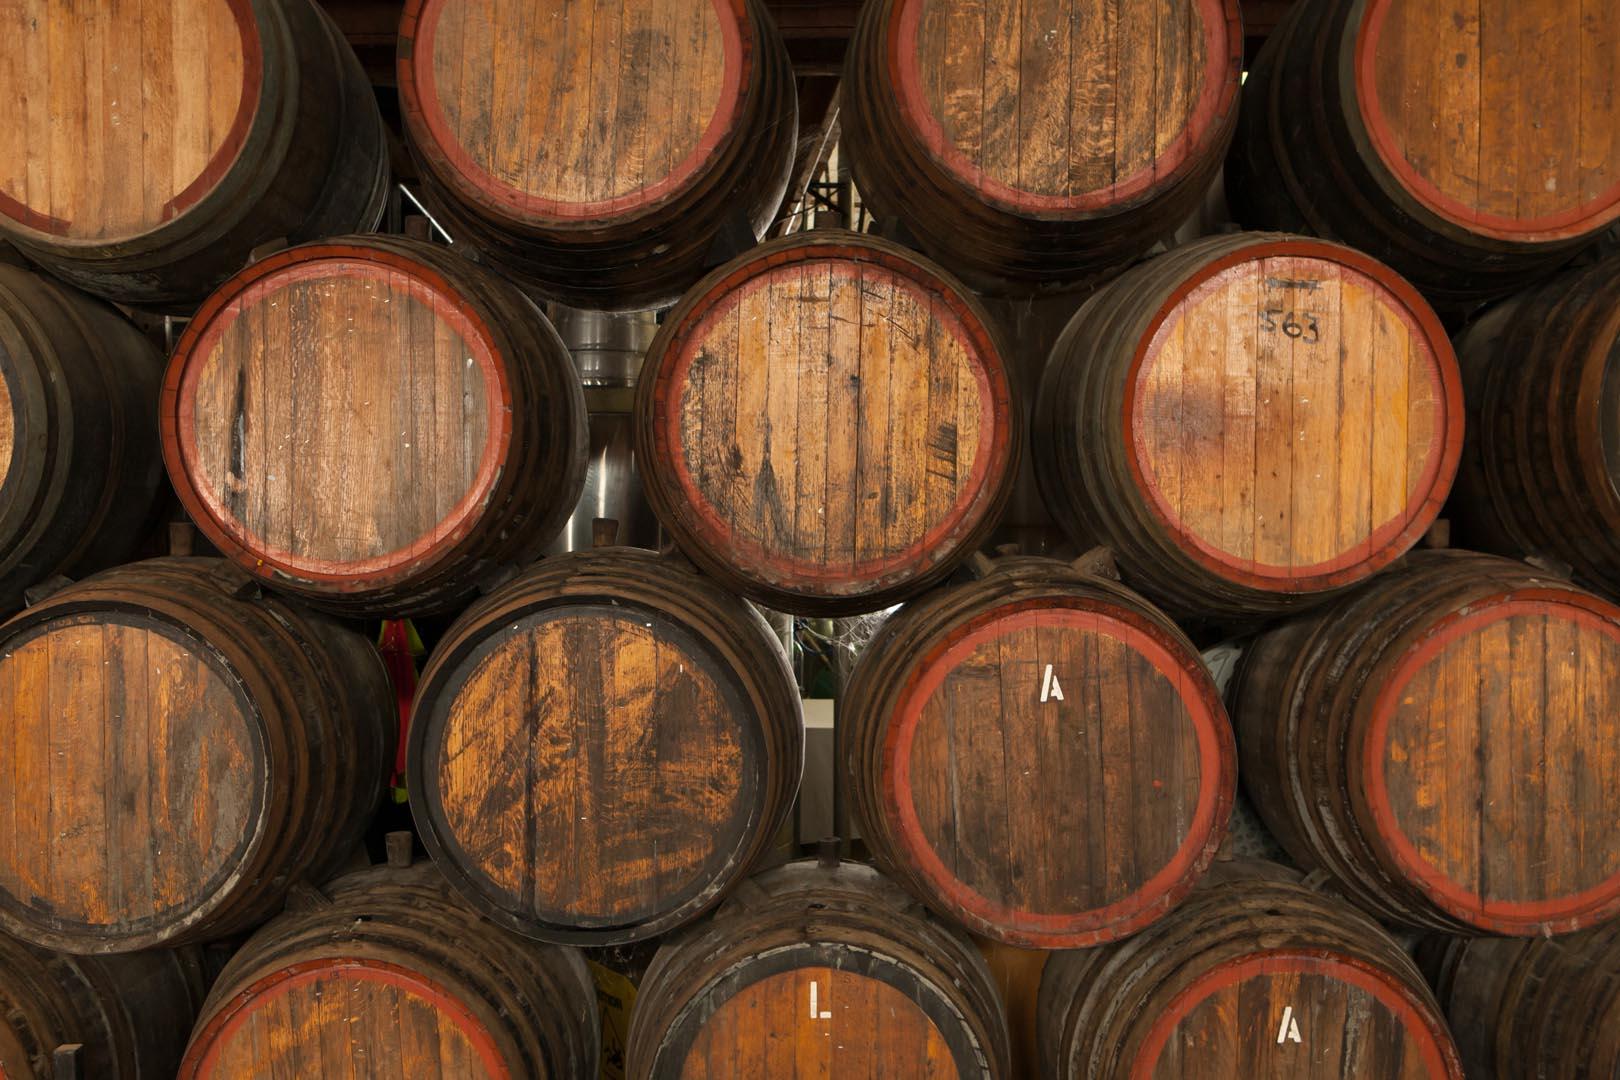 Bitter o Amaro